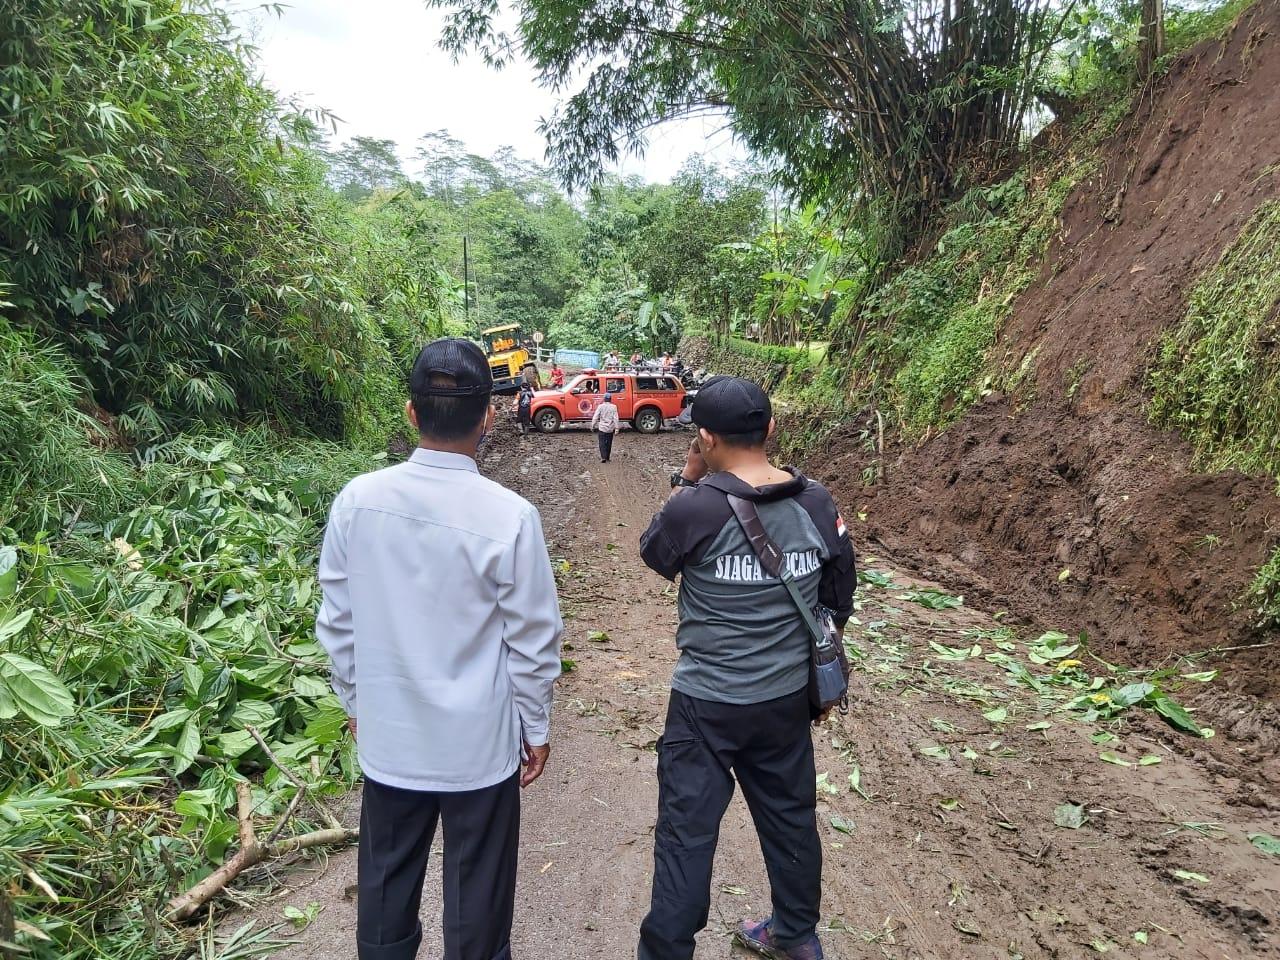 Jalur Desa Krasak Kedungjajang Diterjang Tebing Longsor